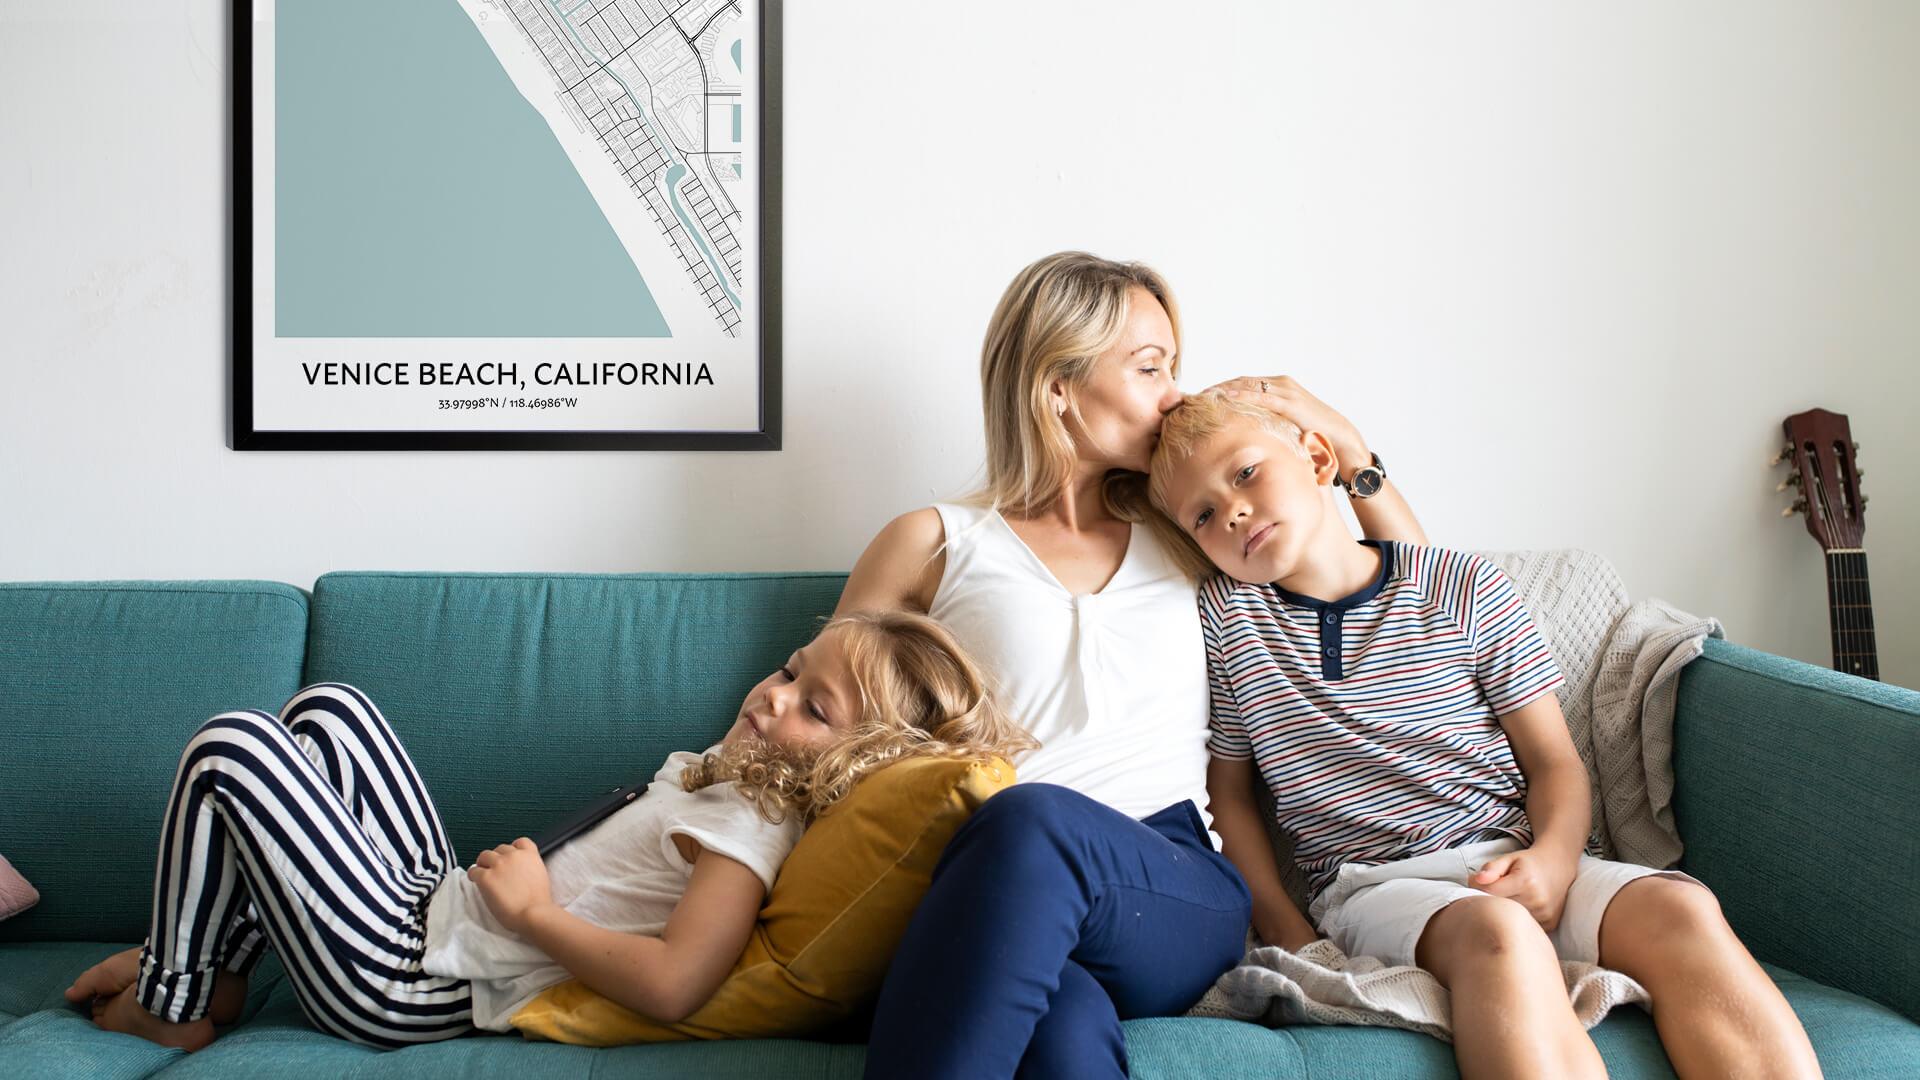 Venice Beach map poster